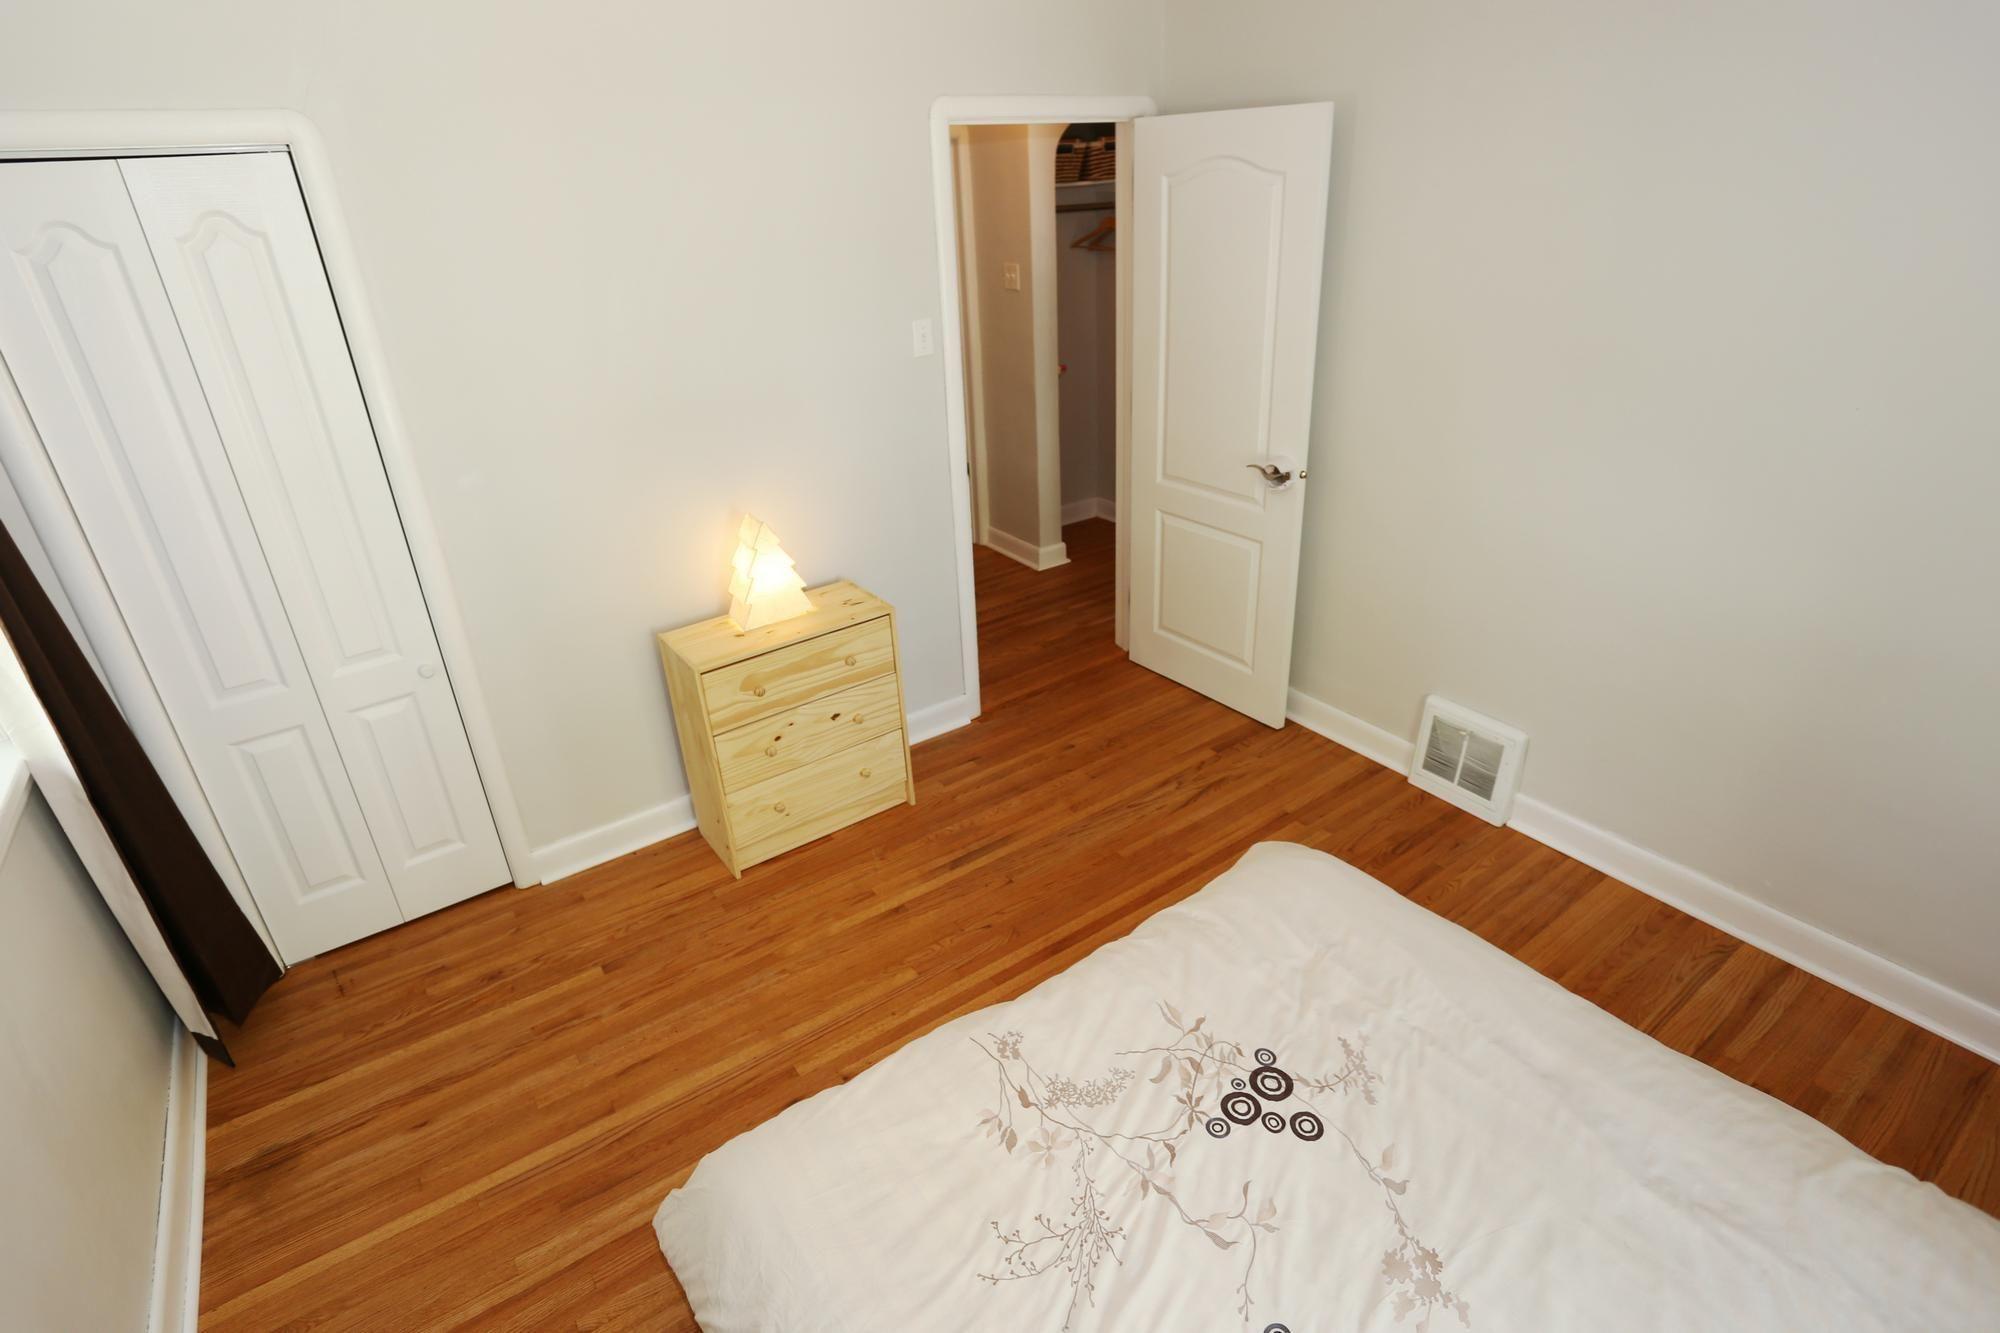 Photo 15: Photos: 290 McLeod Avenue in Winnipeg: North Kildonan Single Family Detached for sale (3F)  : MLS®# 1814938